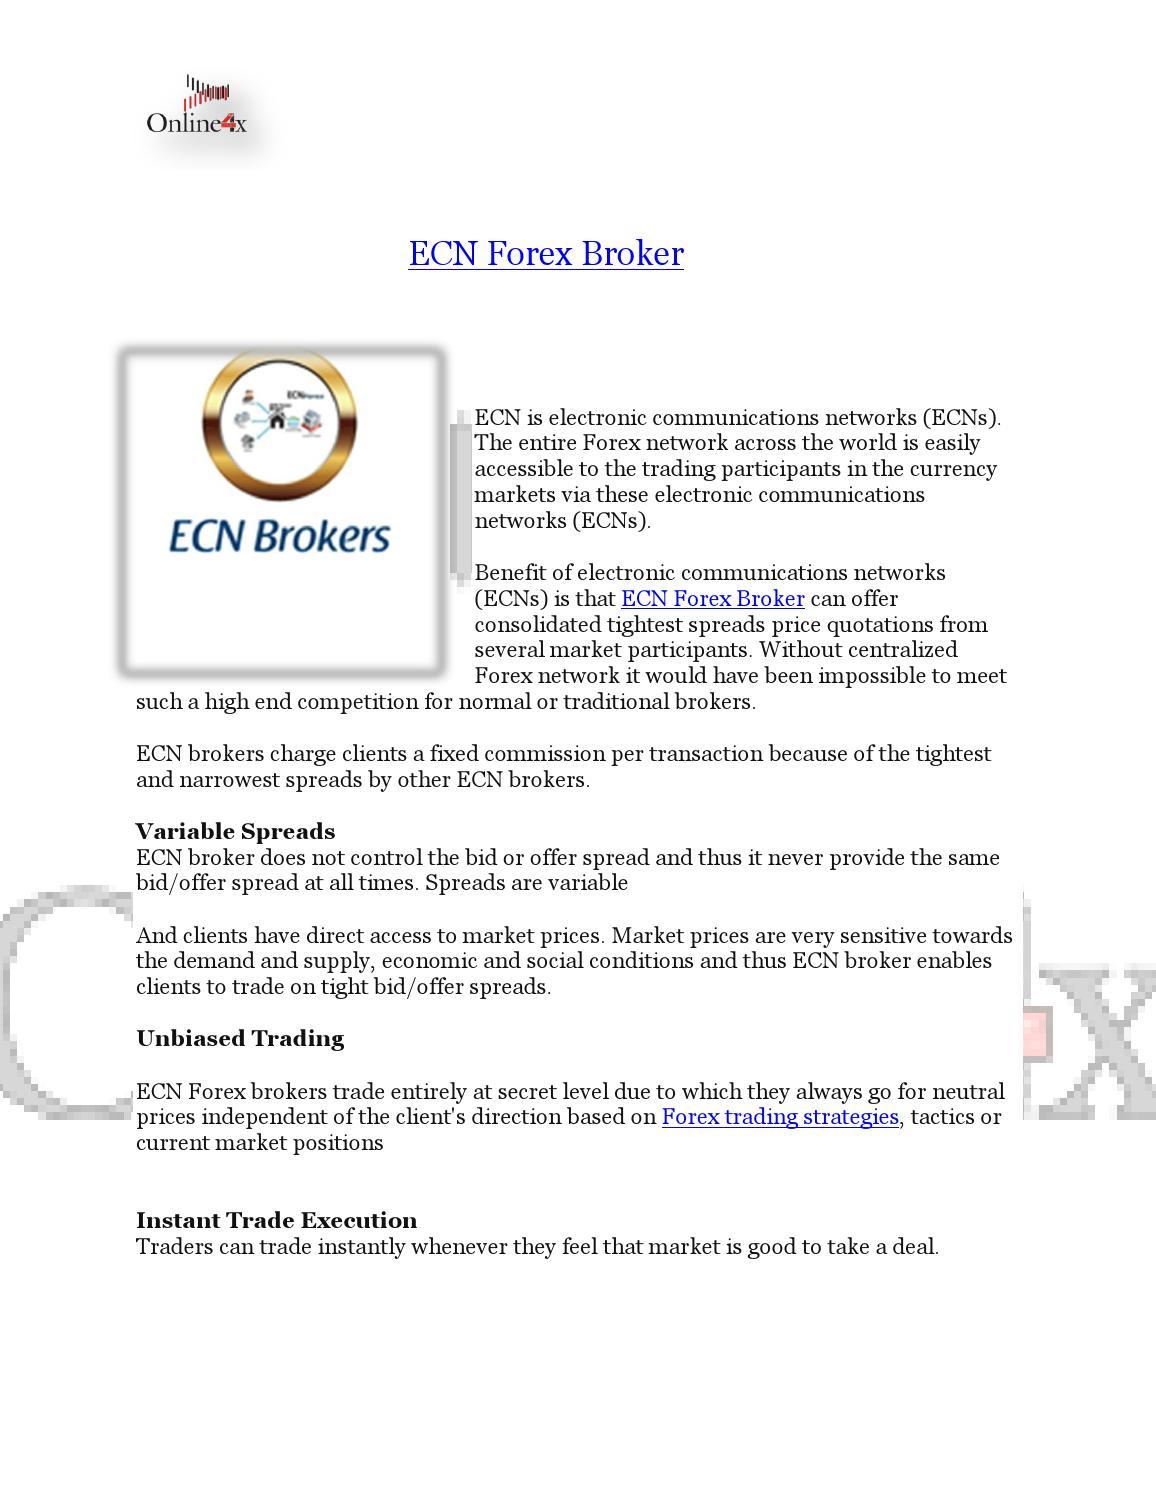 Tight Spread Forex Brokers List: Top 10 Best Tight Spread ()